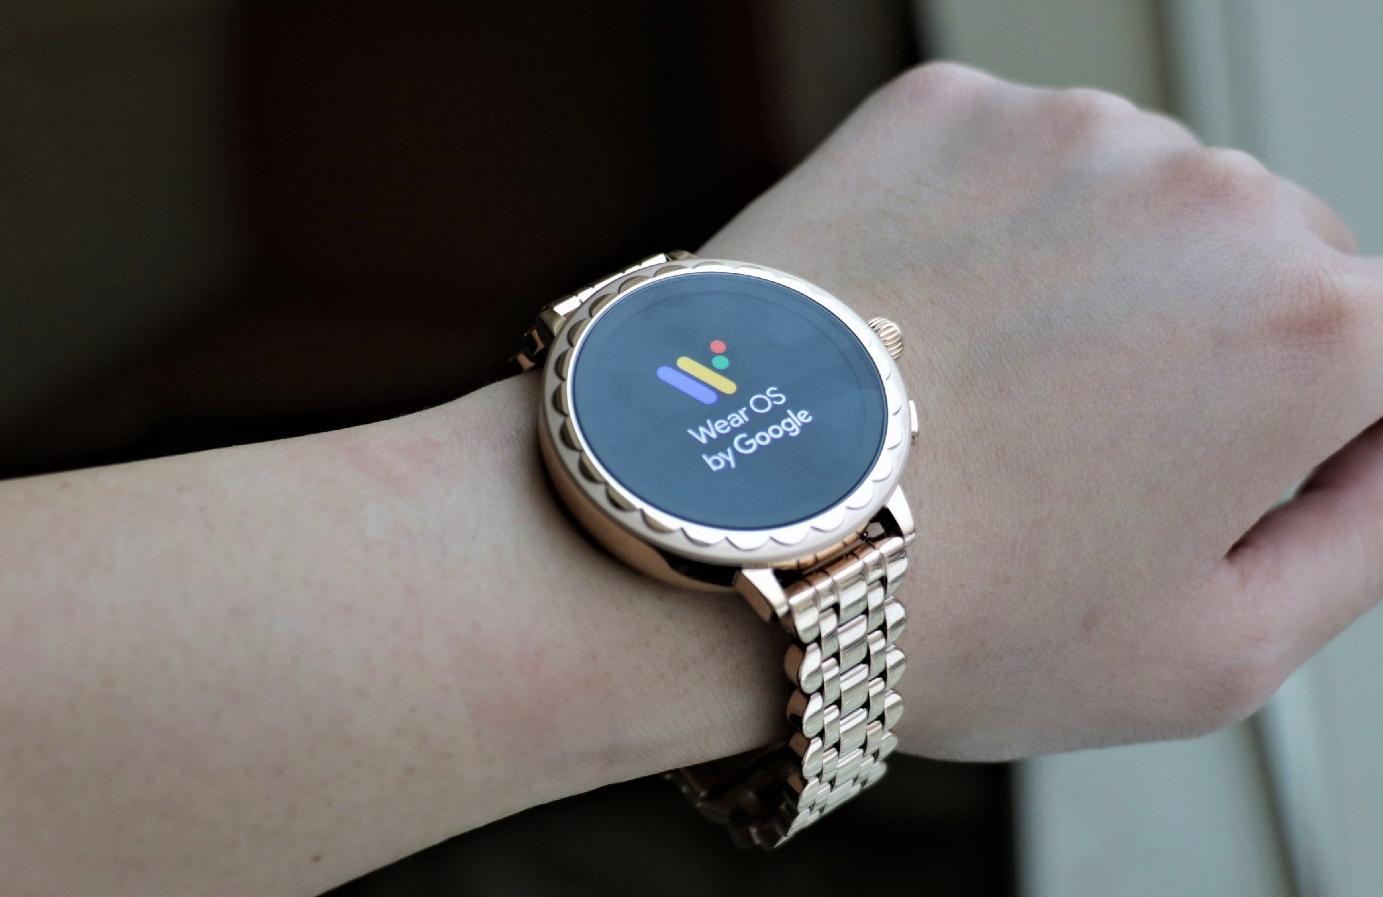 Photo of ساعة Scallop Smartwatch 2 أحدث إصدار لشركة Kate Spade في #CES2019